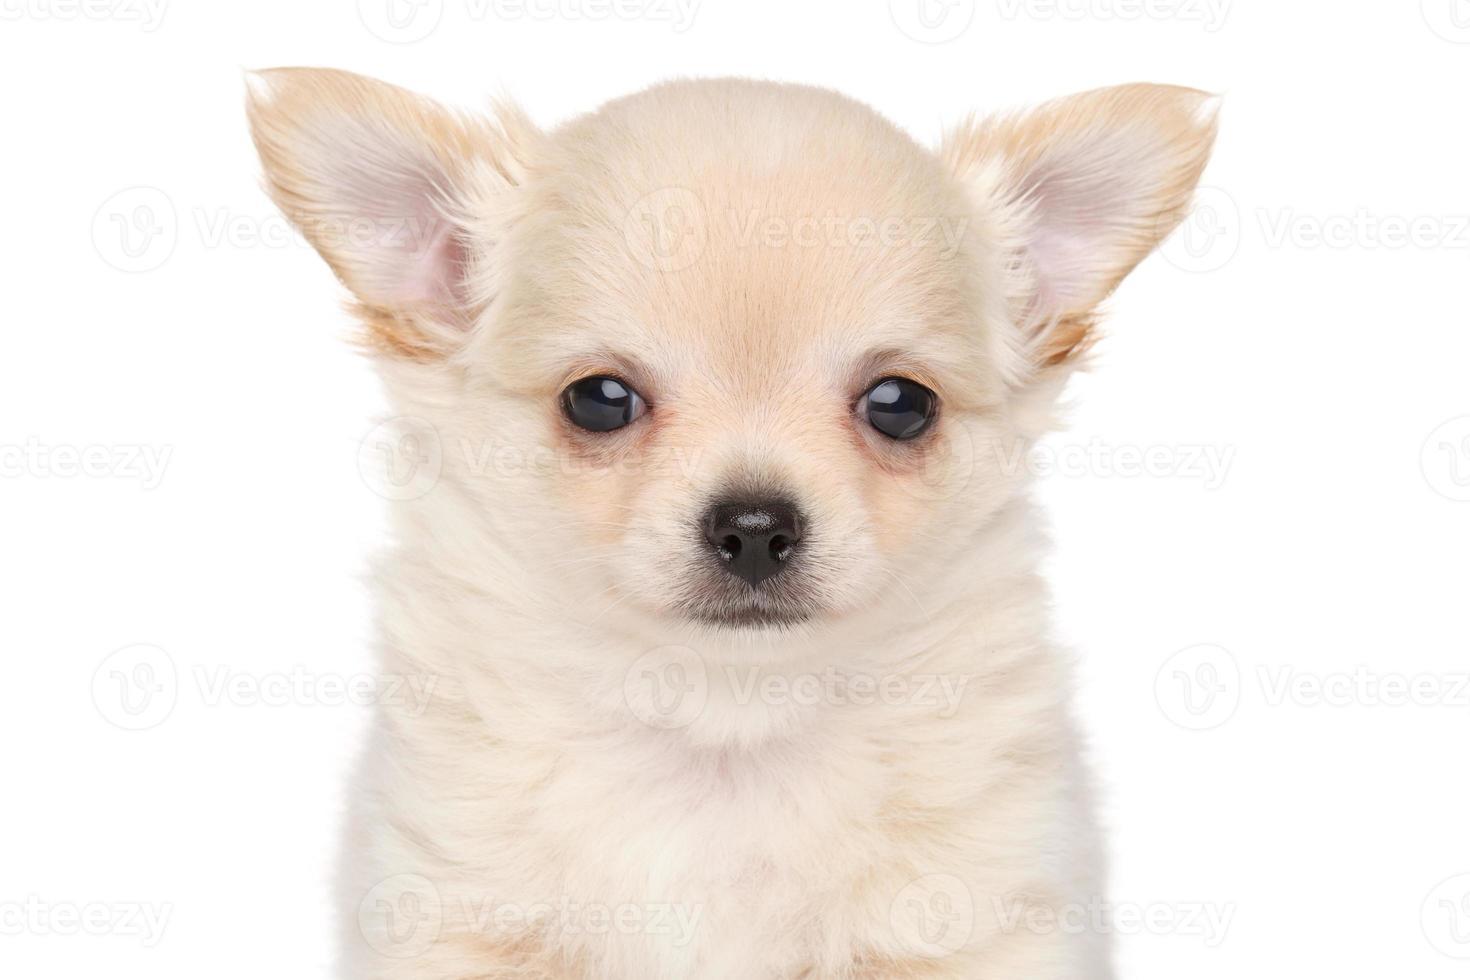 langharige chihuahua puppy foto